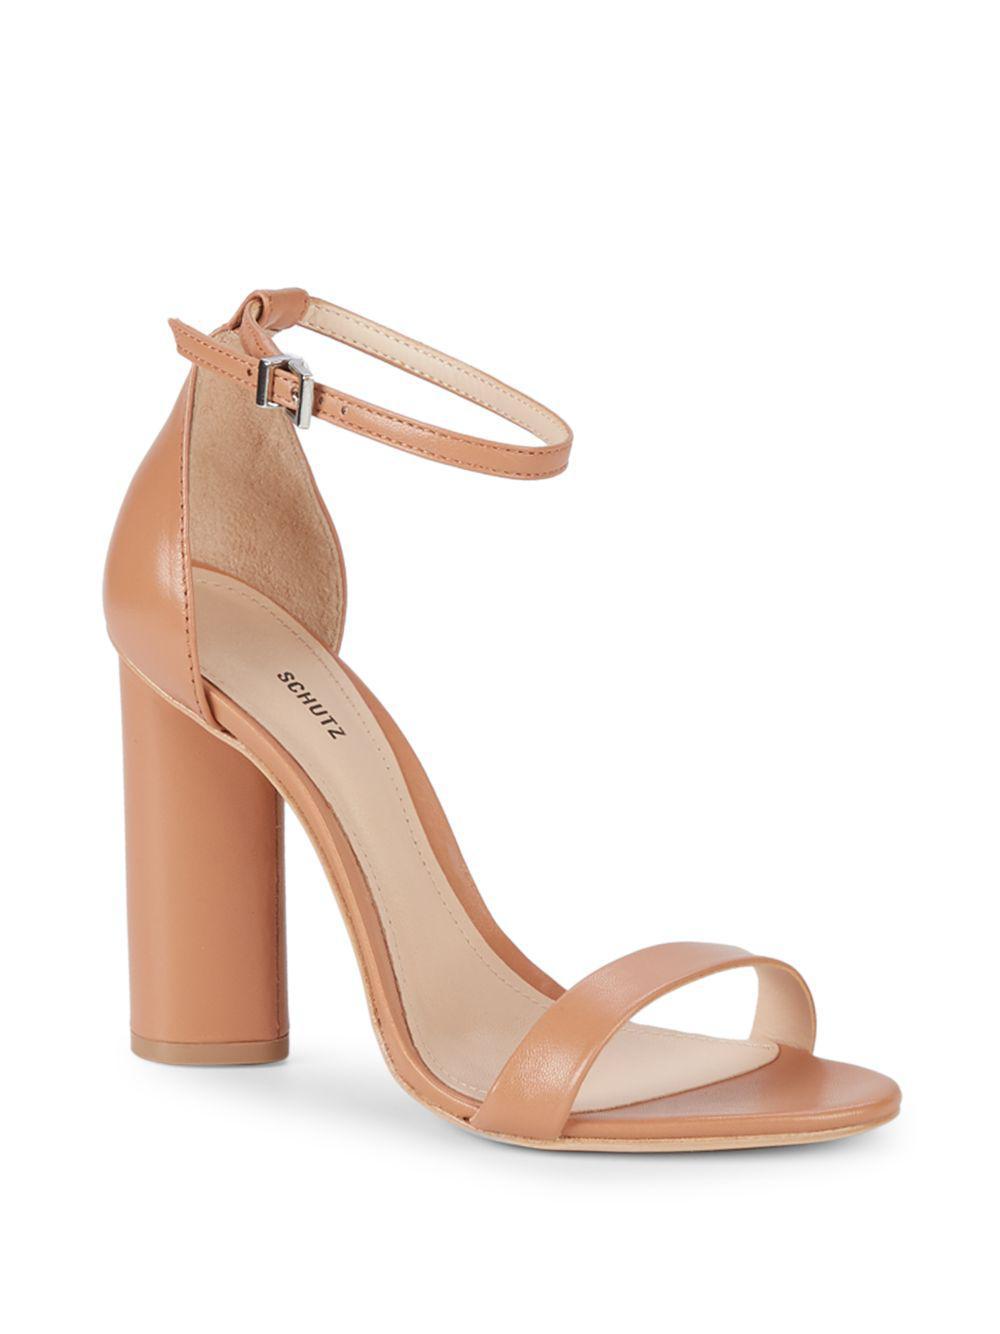 b167b0aae21dd8 Lyst - Schutz Block Heel Leather Ankle-strap Sandals